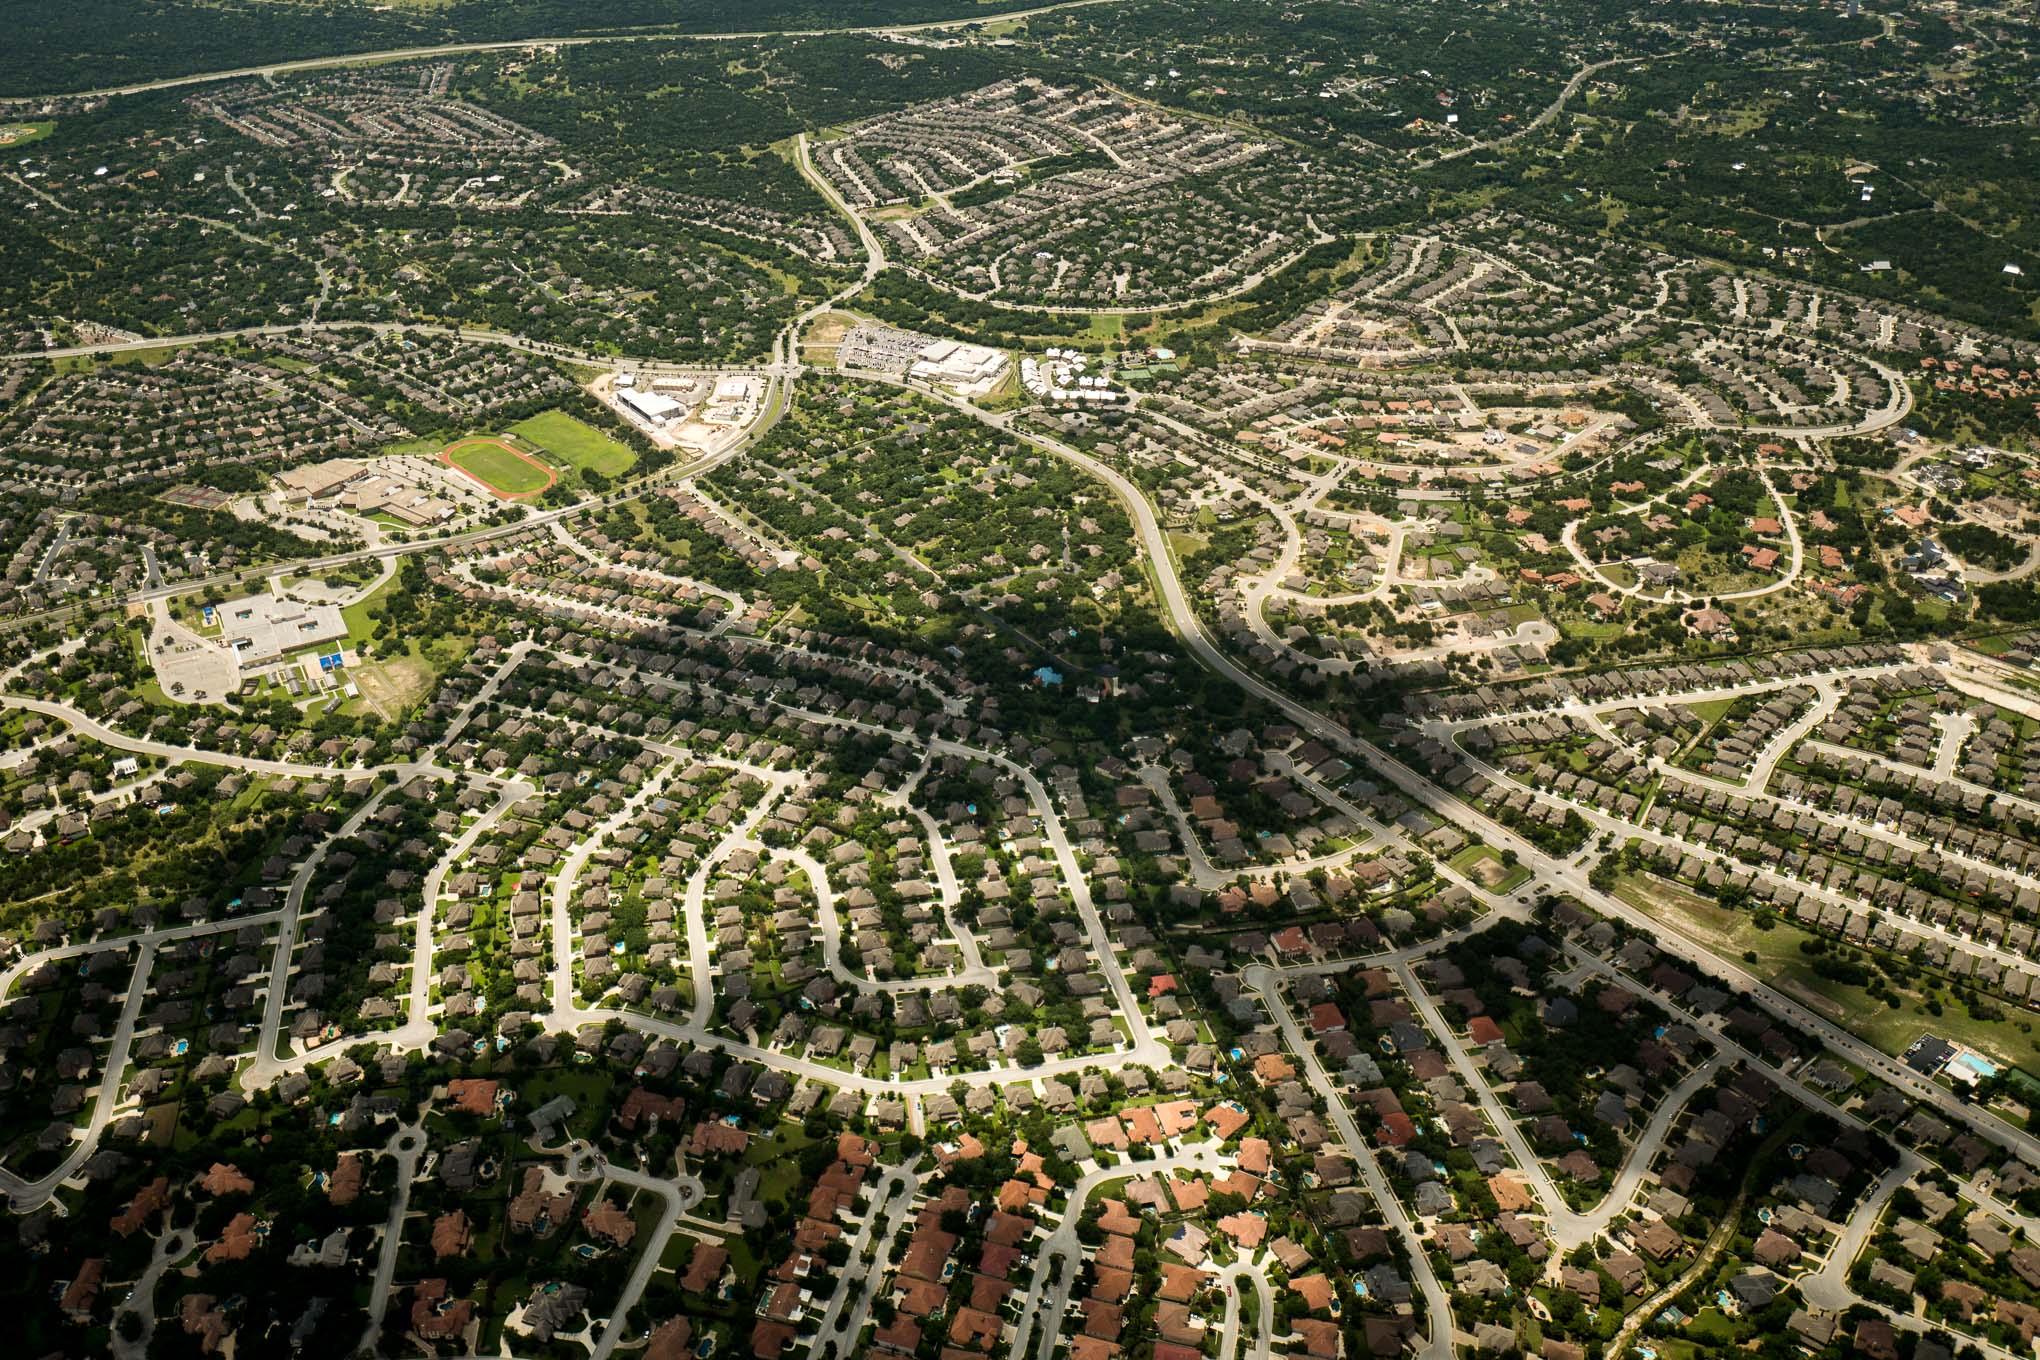 Aerial photo of suburban growth on San Antonio's far Westside.